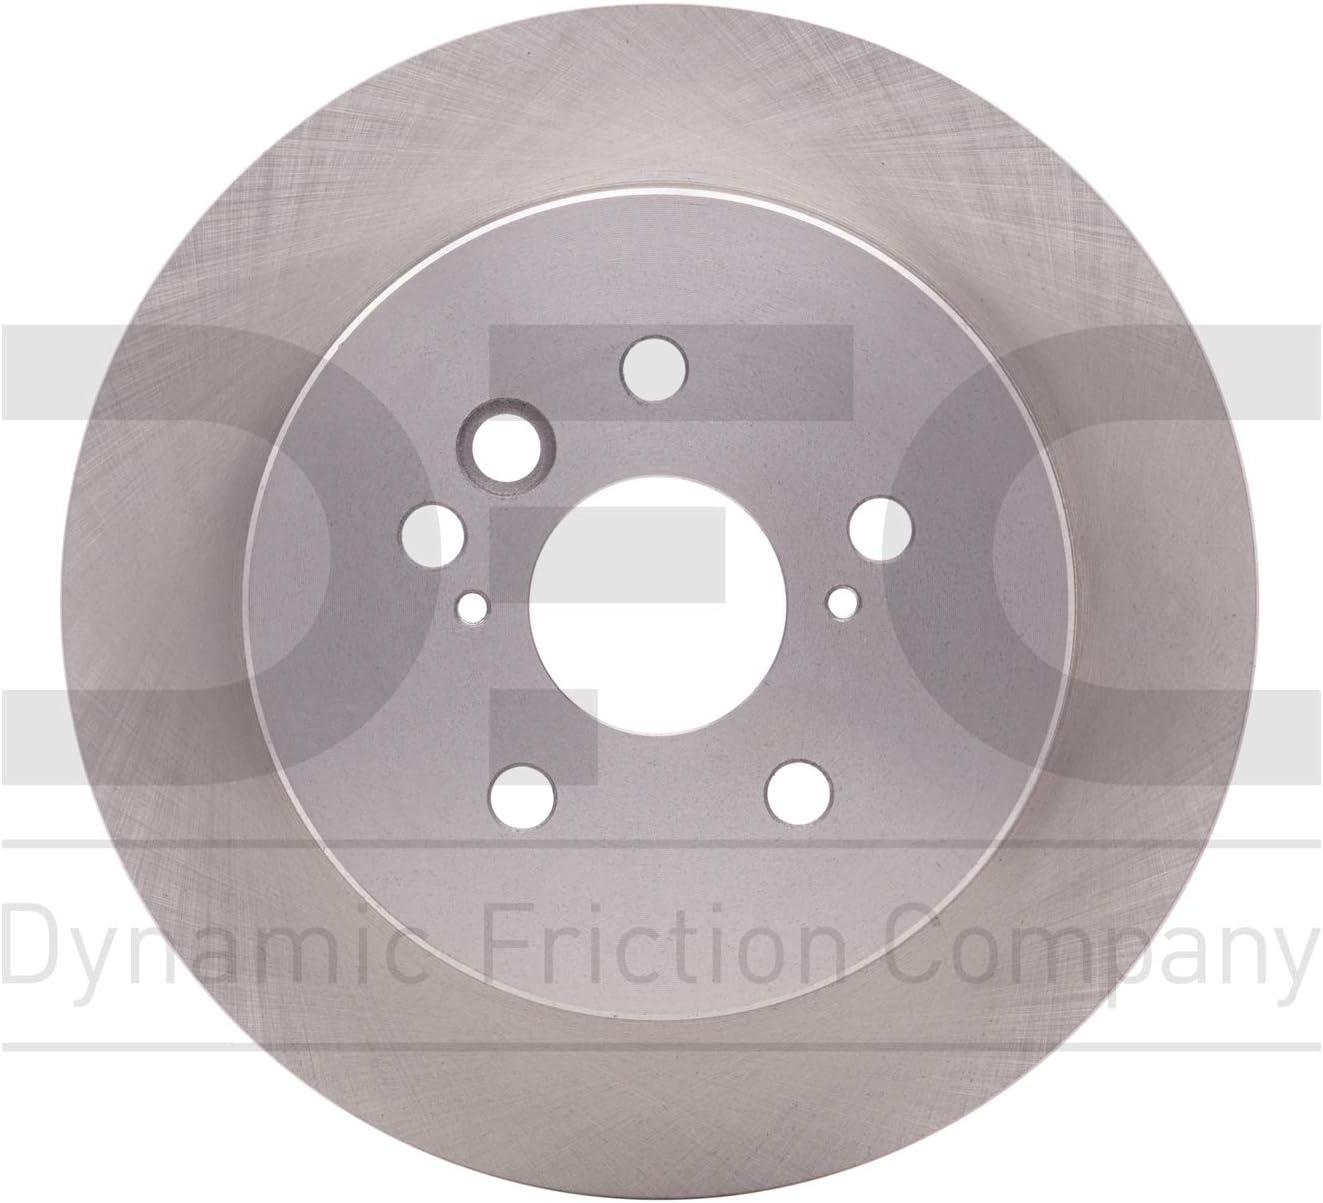 Rear Dynamic Friction Company Disc 1 600-76132 Rotor Max Seasonal Wrap Introduction 64% OFF Brake